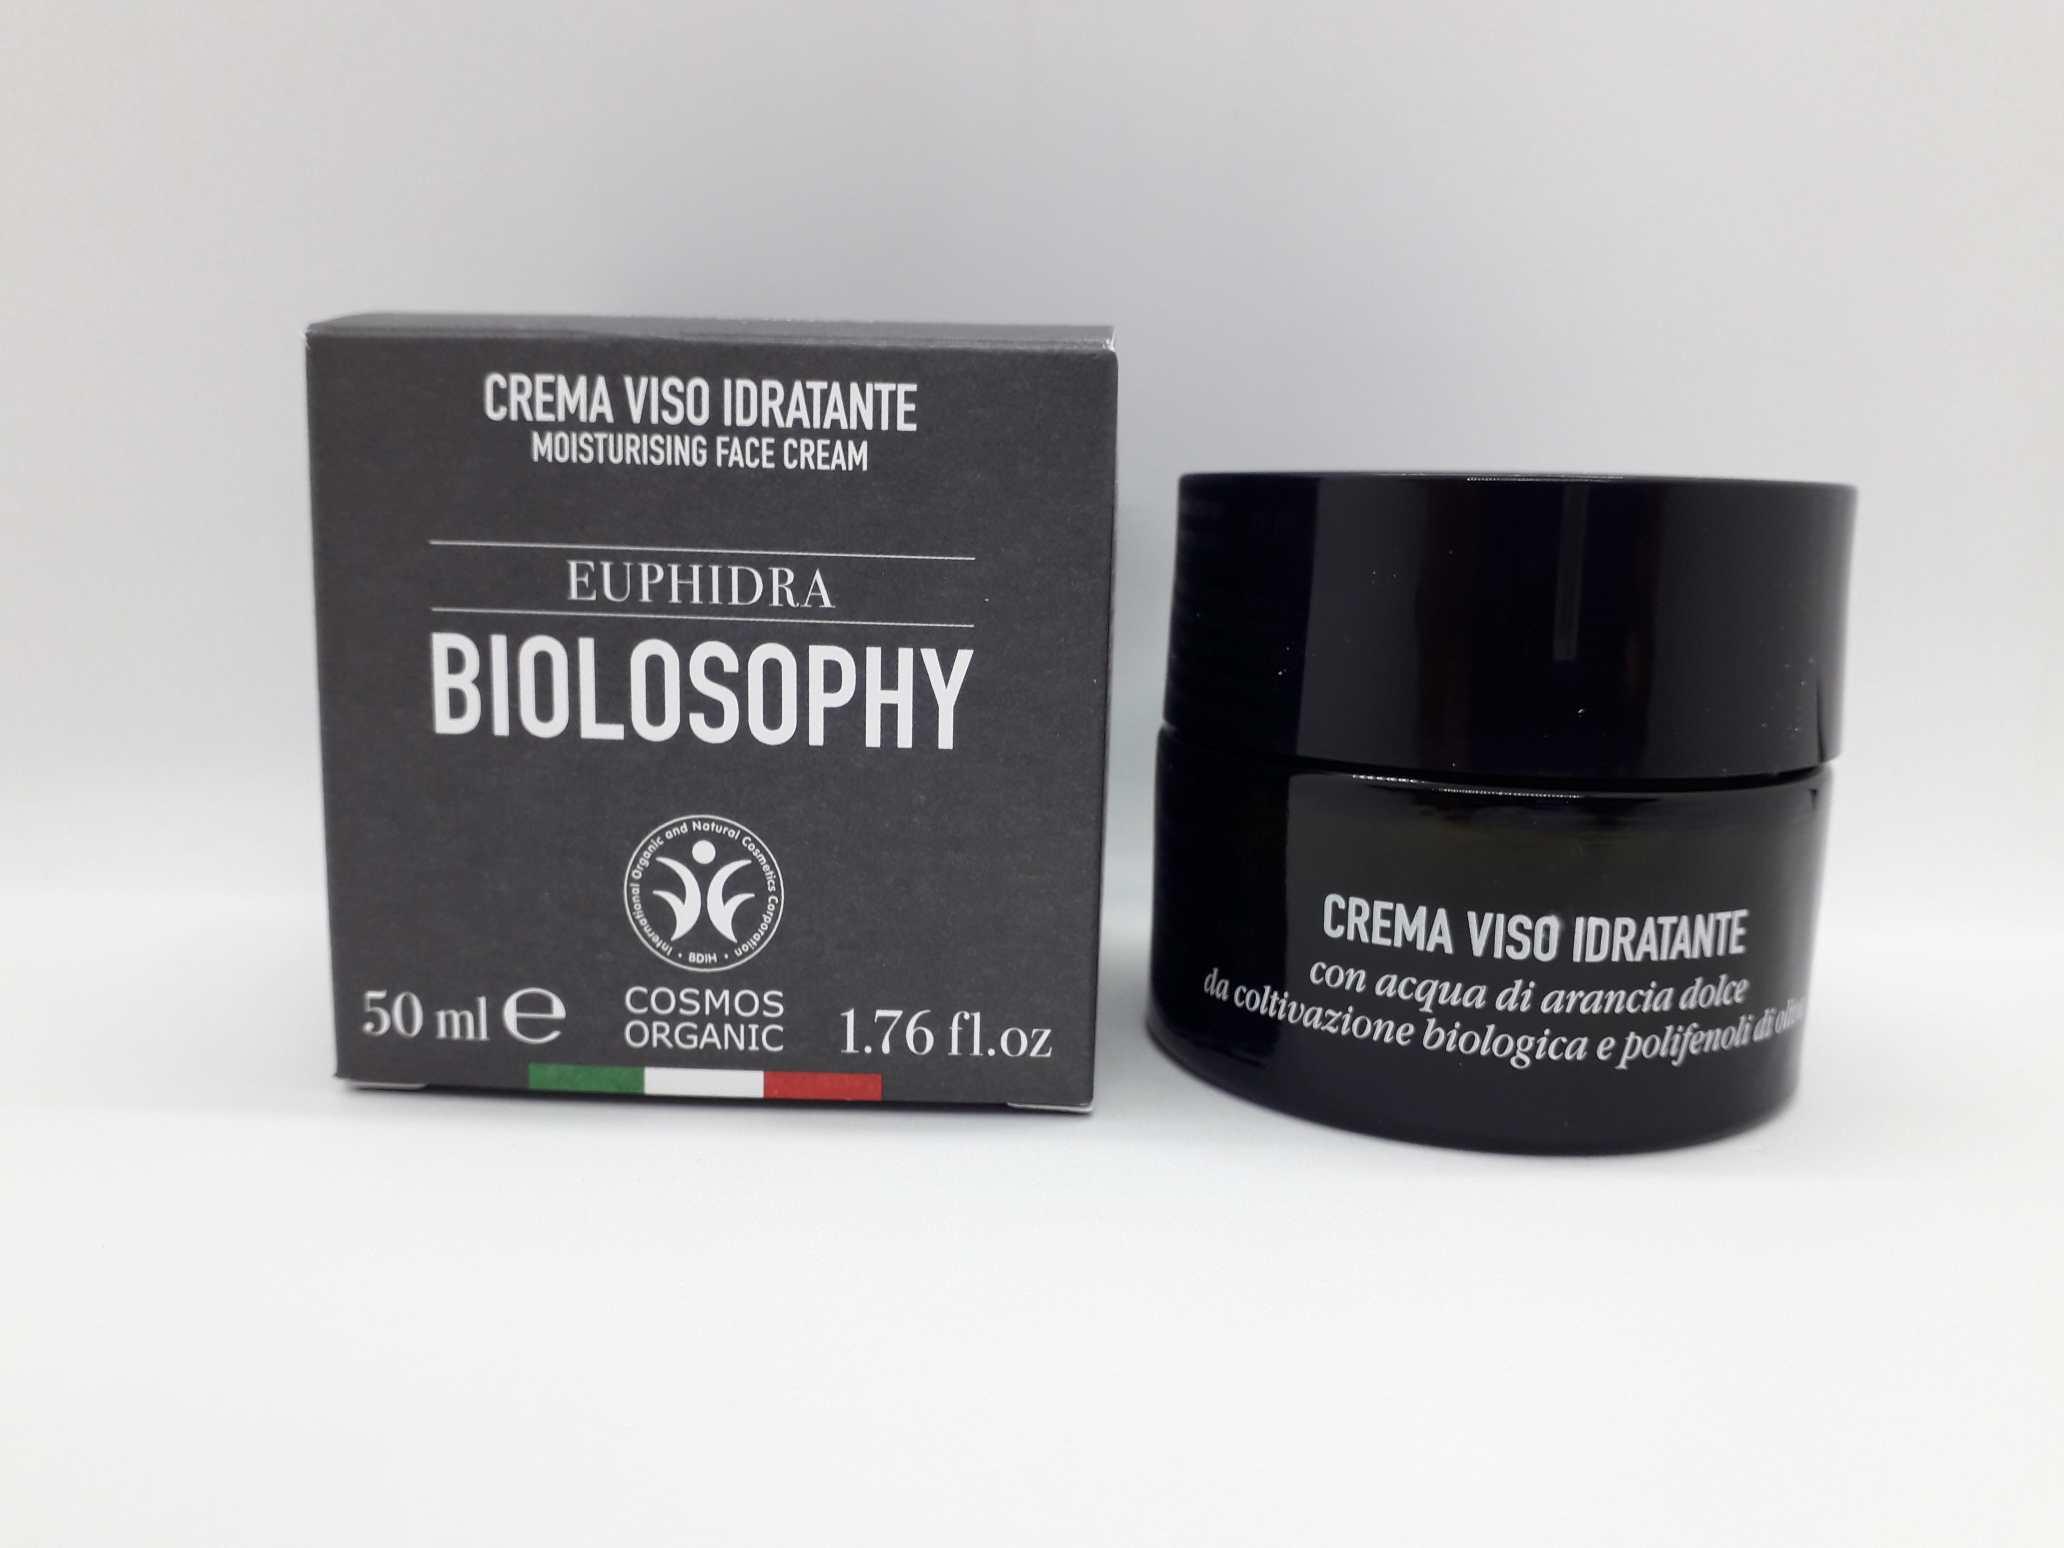 EUPHIDRA BIOLOSOPHY CREMA VISO IDRATANTE 50 ML - Farmaciaempatica.it